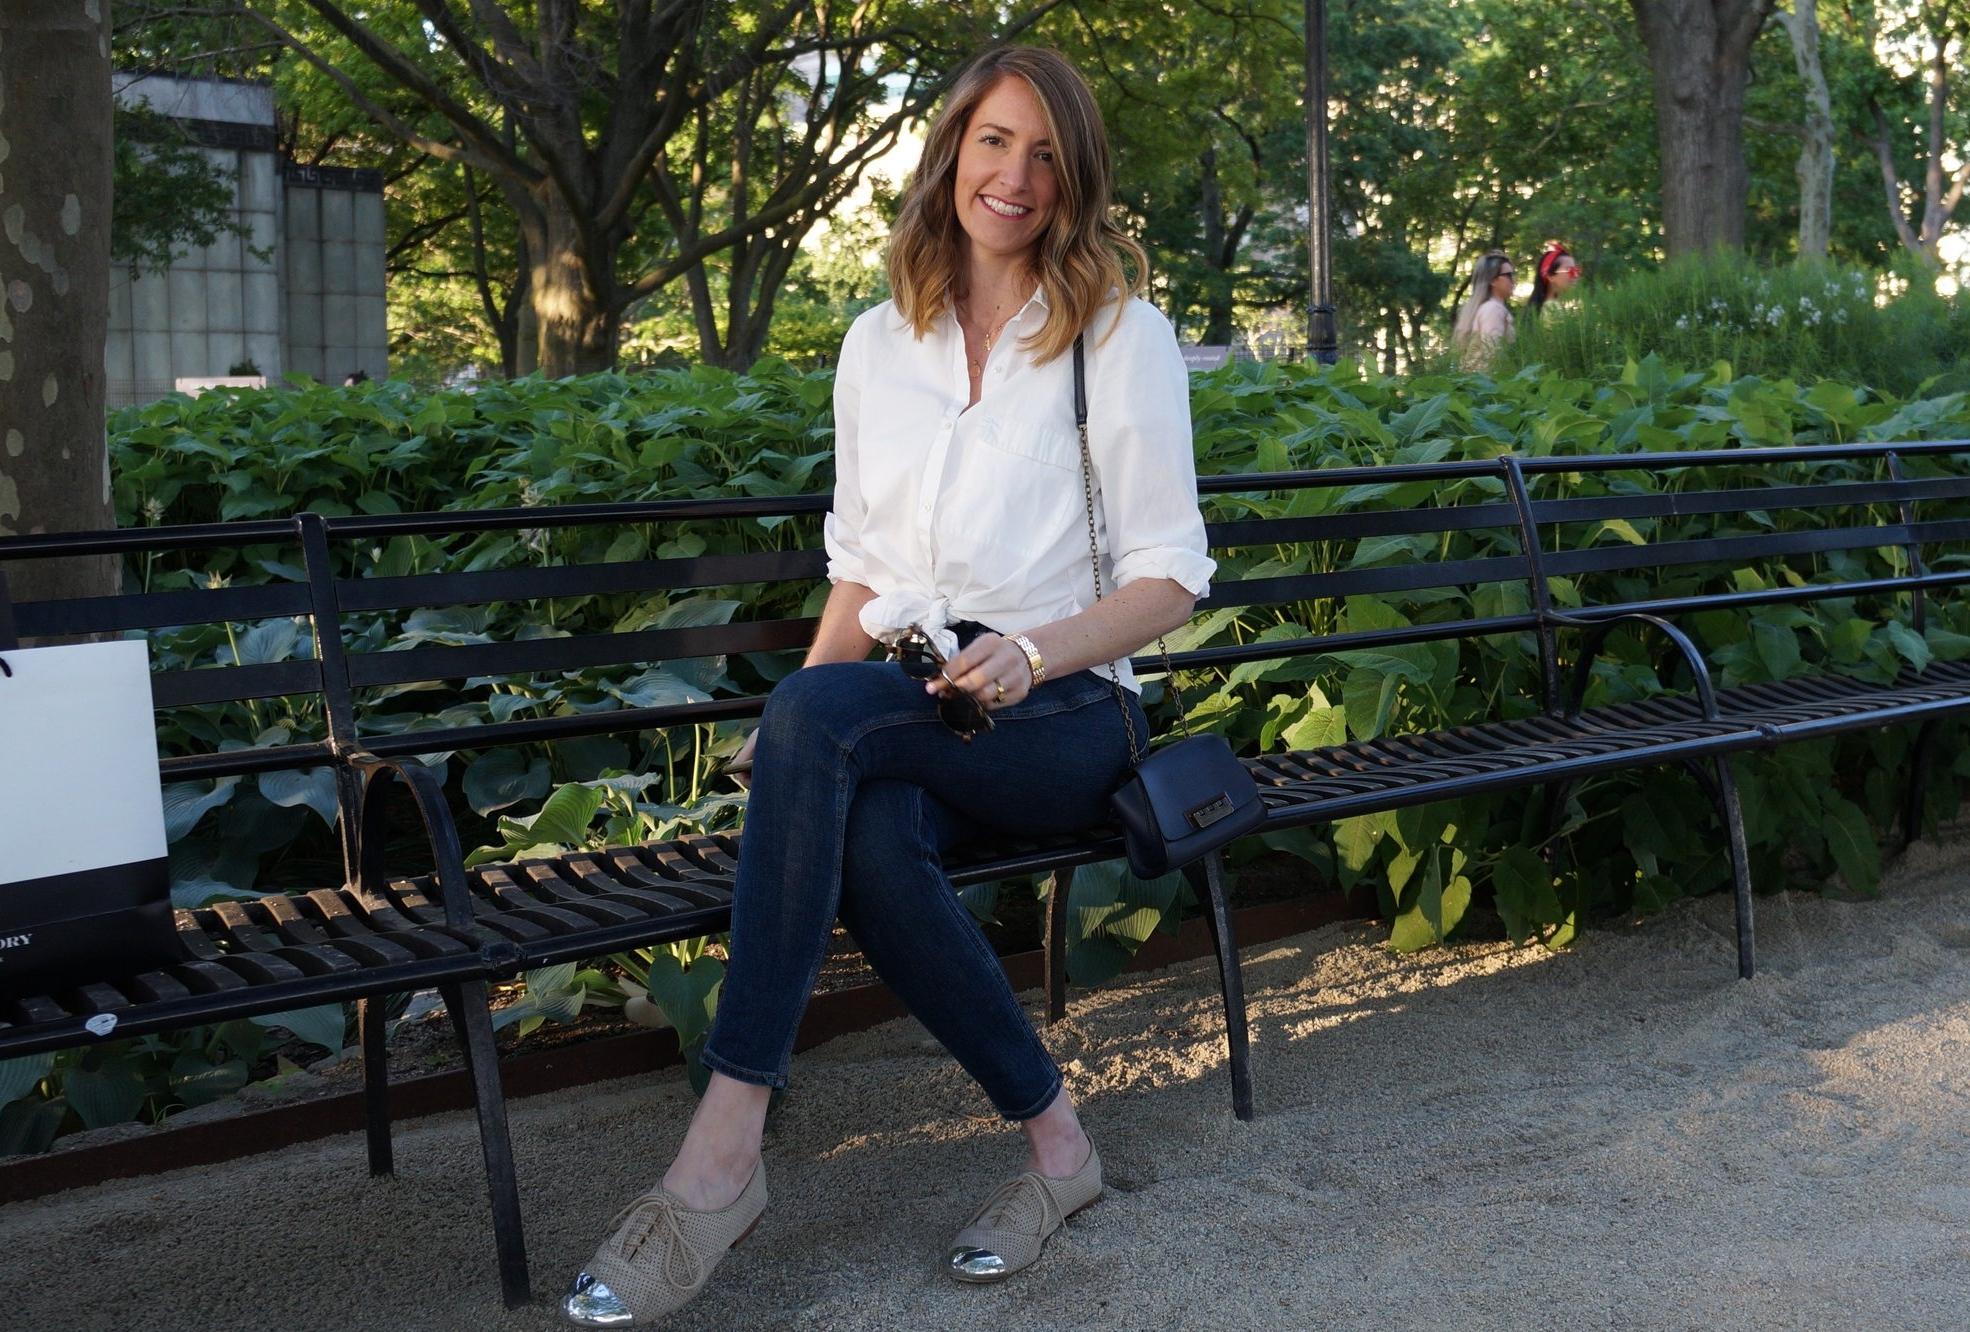 allie-brandwein-stylist-image-wardrobe-consultant-nyc_after_shopping_battery_park